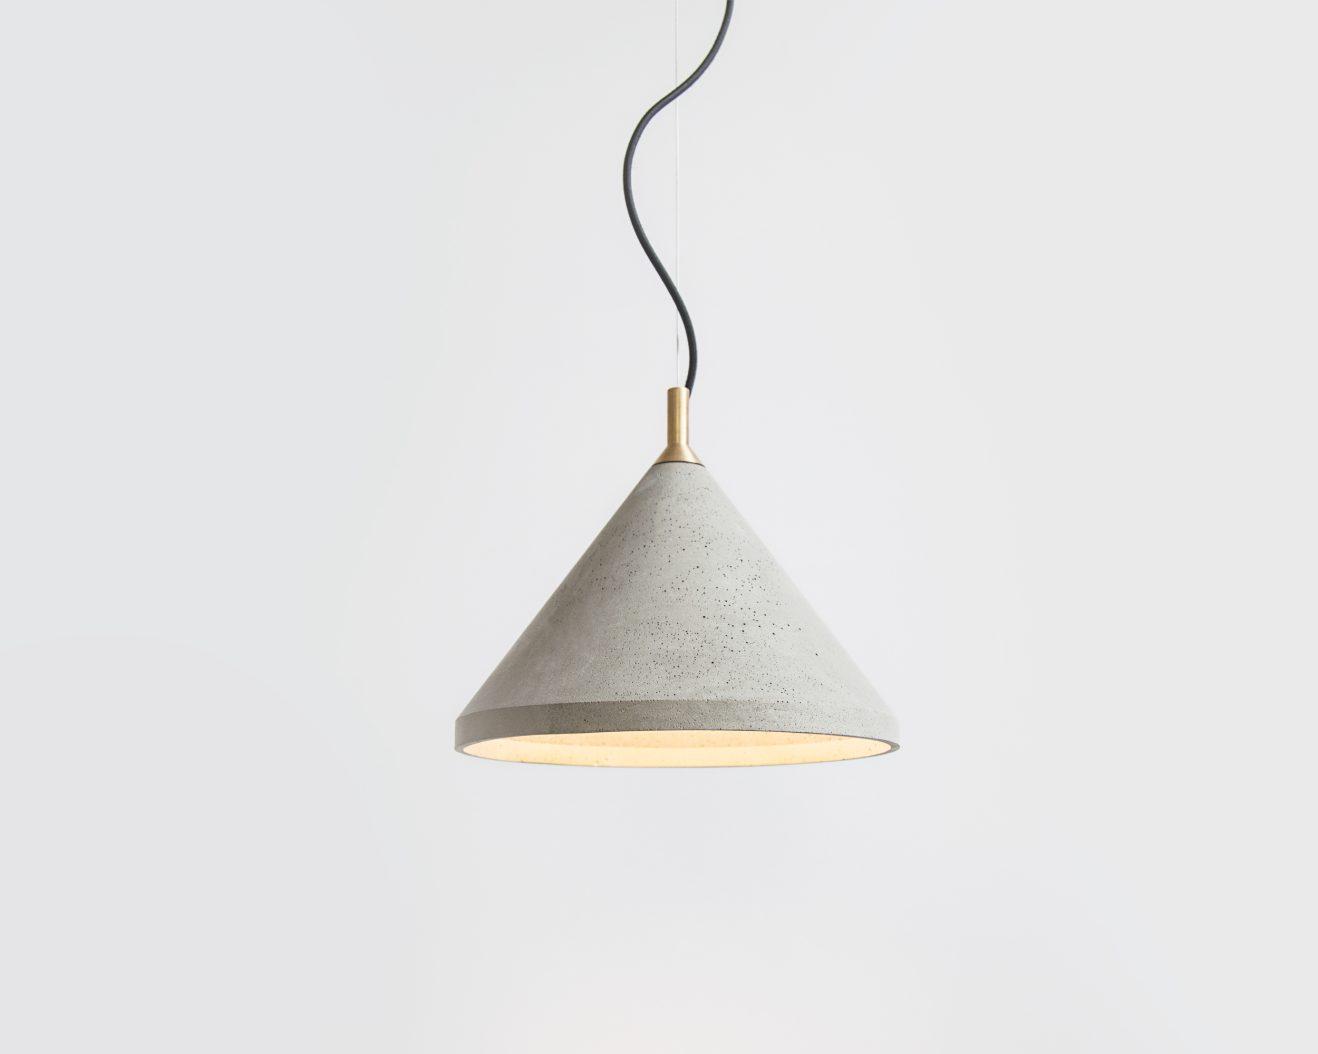 Ren_Bentu_Design_Lamp-Ren-1